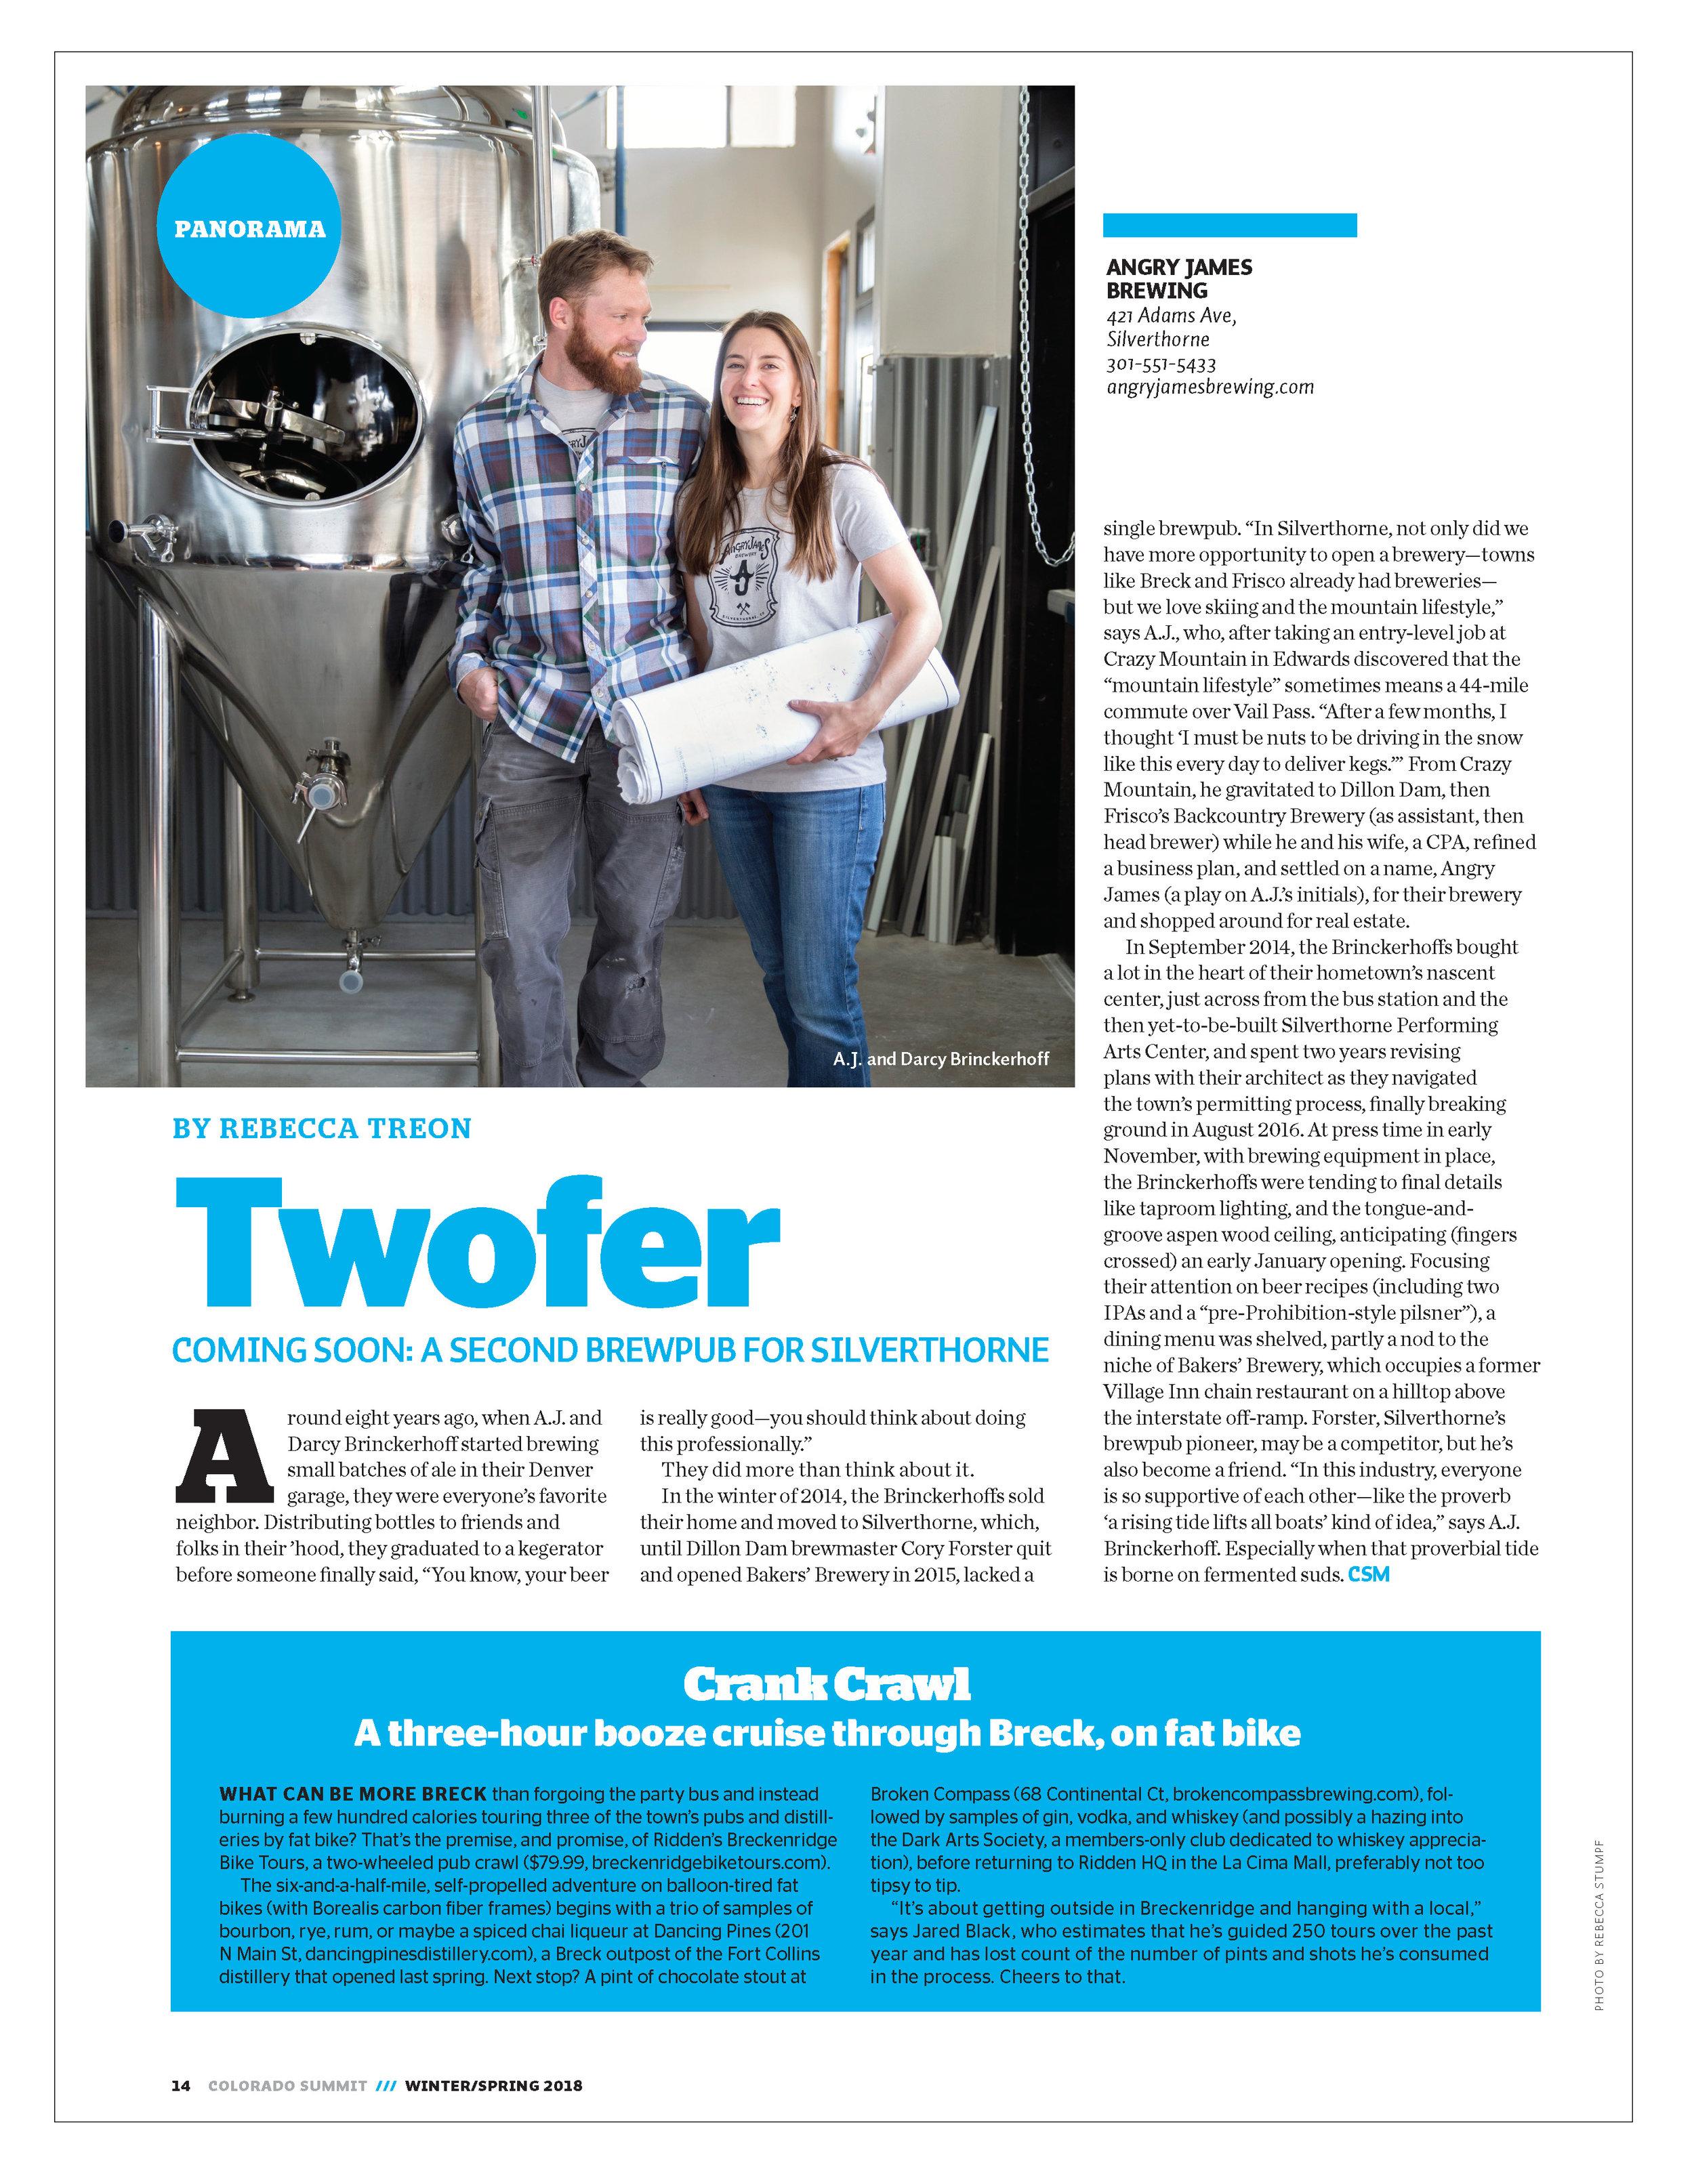 Rstumpf_VailMagazine.jpg